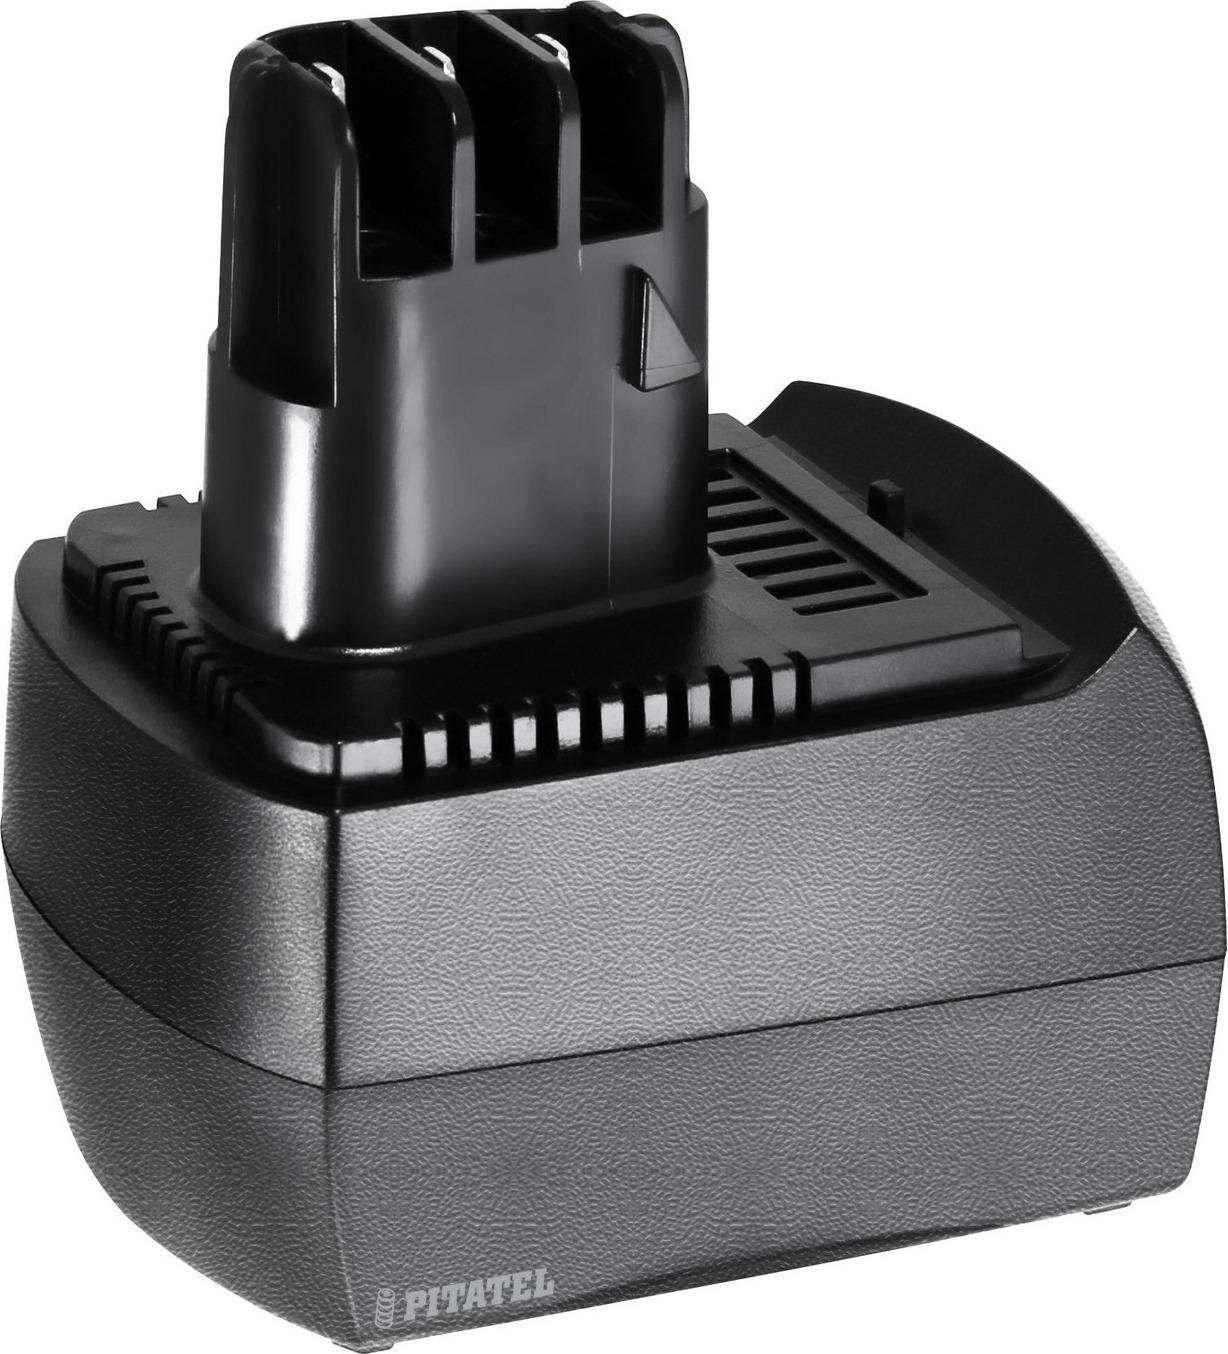 Аккумулятор для инструмента Pitatel для METABO. TSB-103-MET12A-15C цена и фото